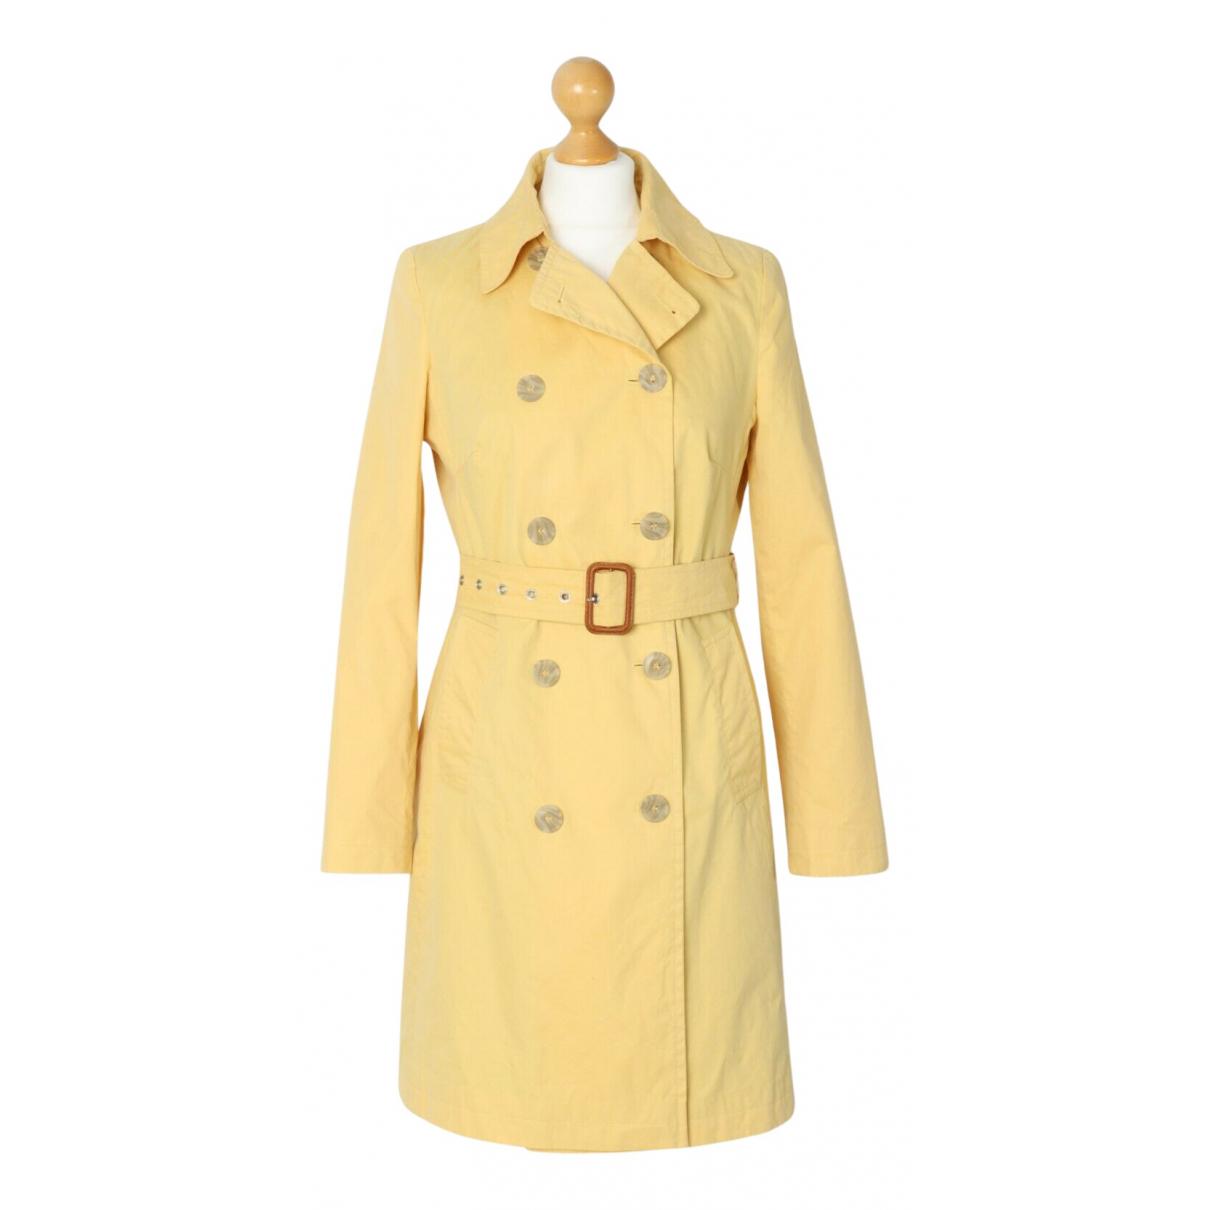 Boden \N Yellow Cotton coat for Women 10 UK